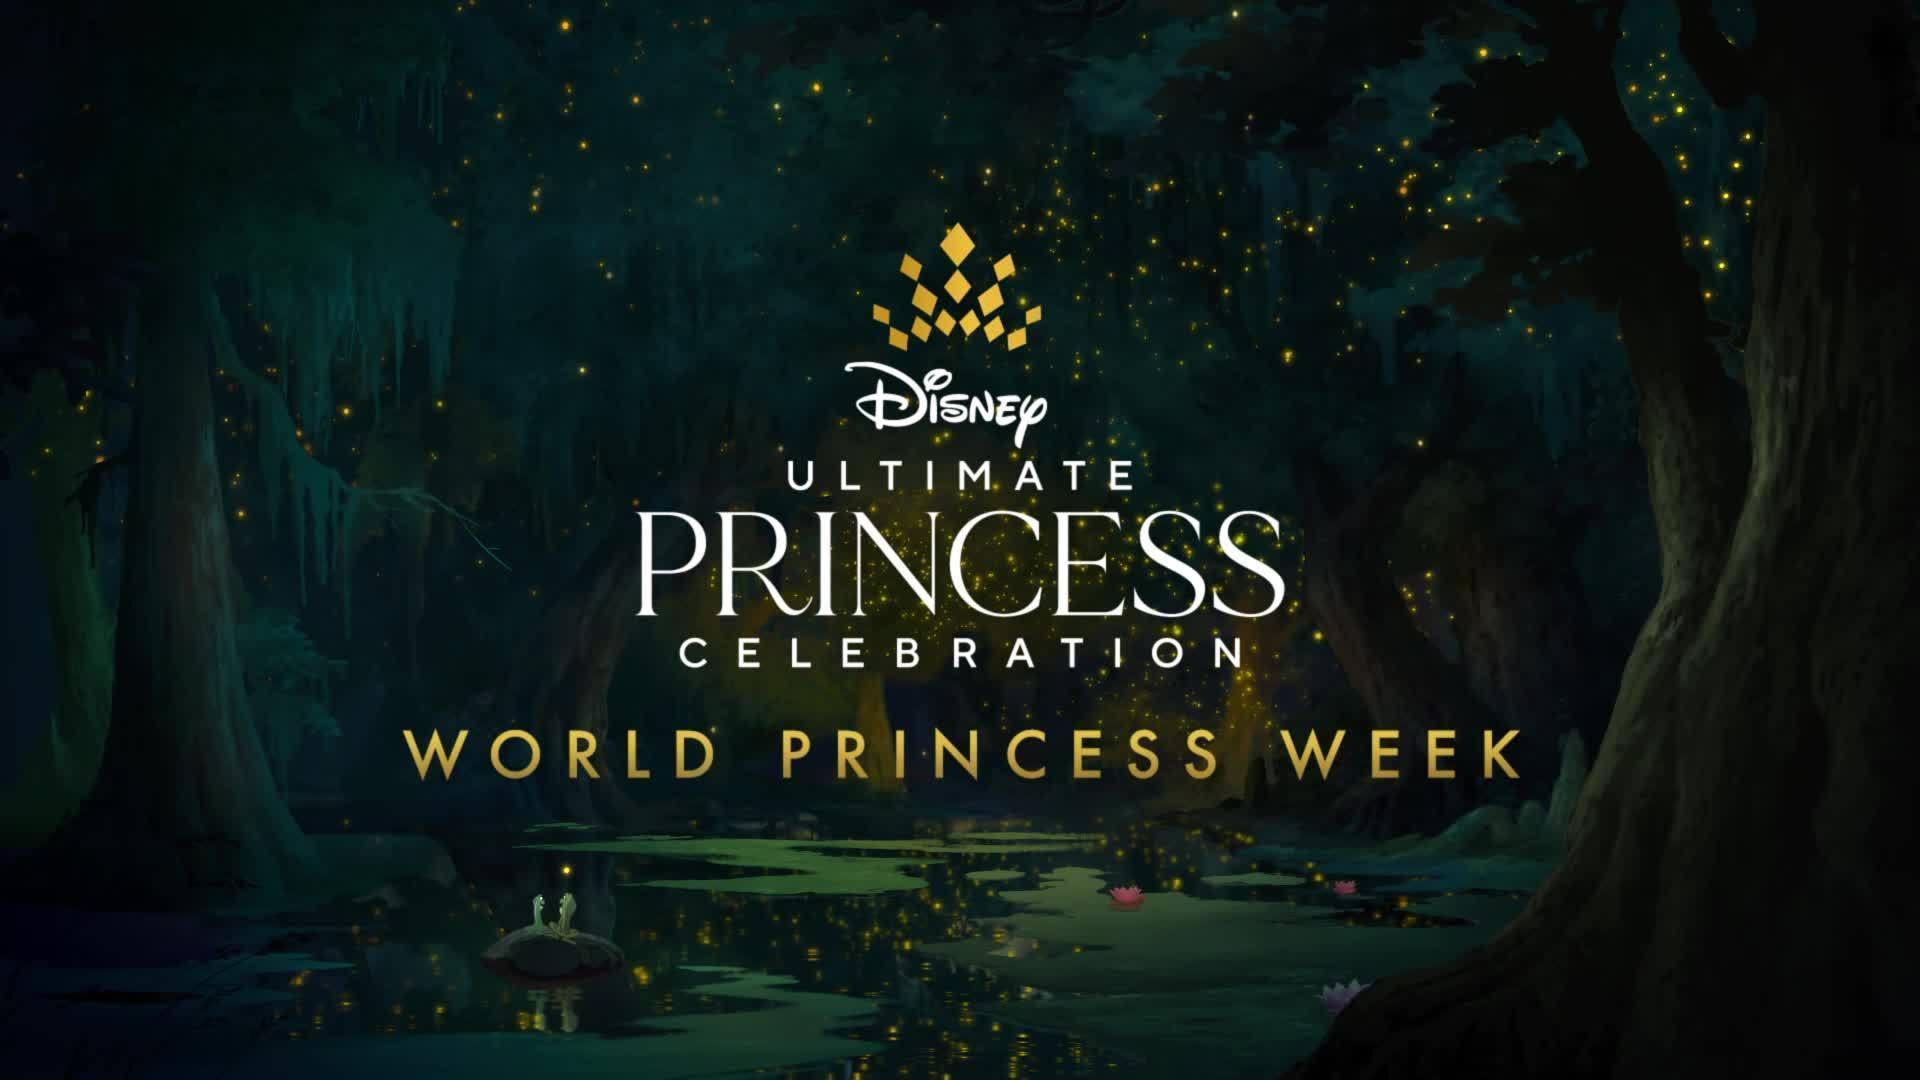 Celebrate World Princess Week! | Ultimate Princess Celebration